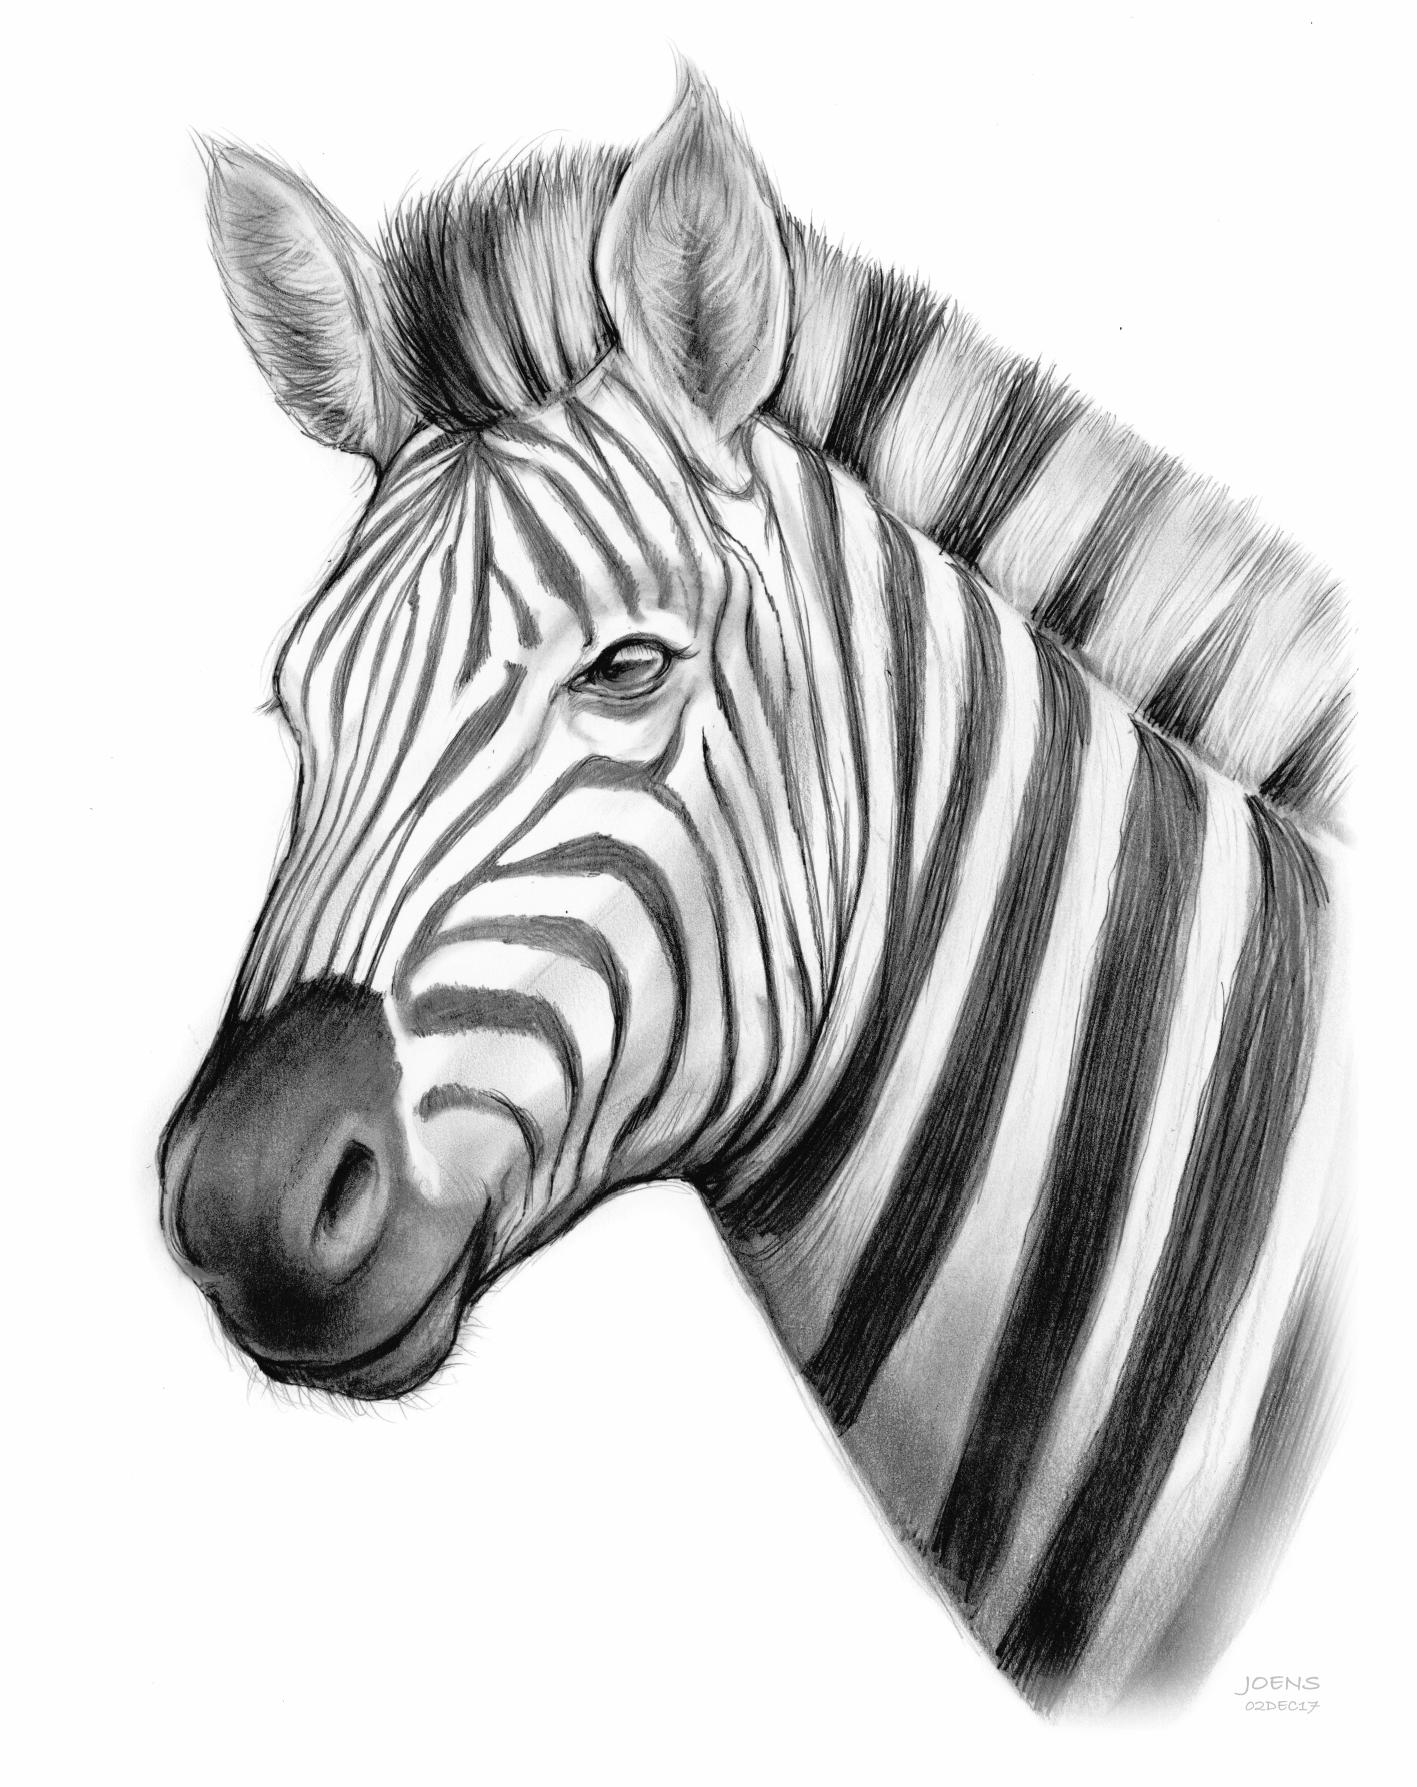 Zebra by Greg Joens | ArtWanted.com